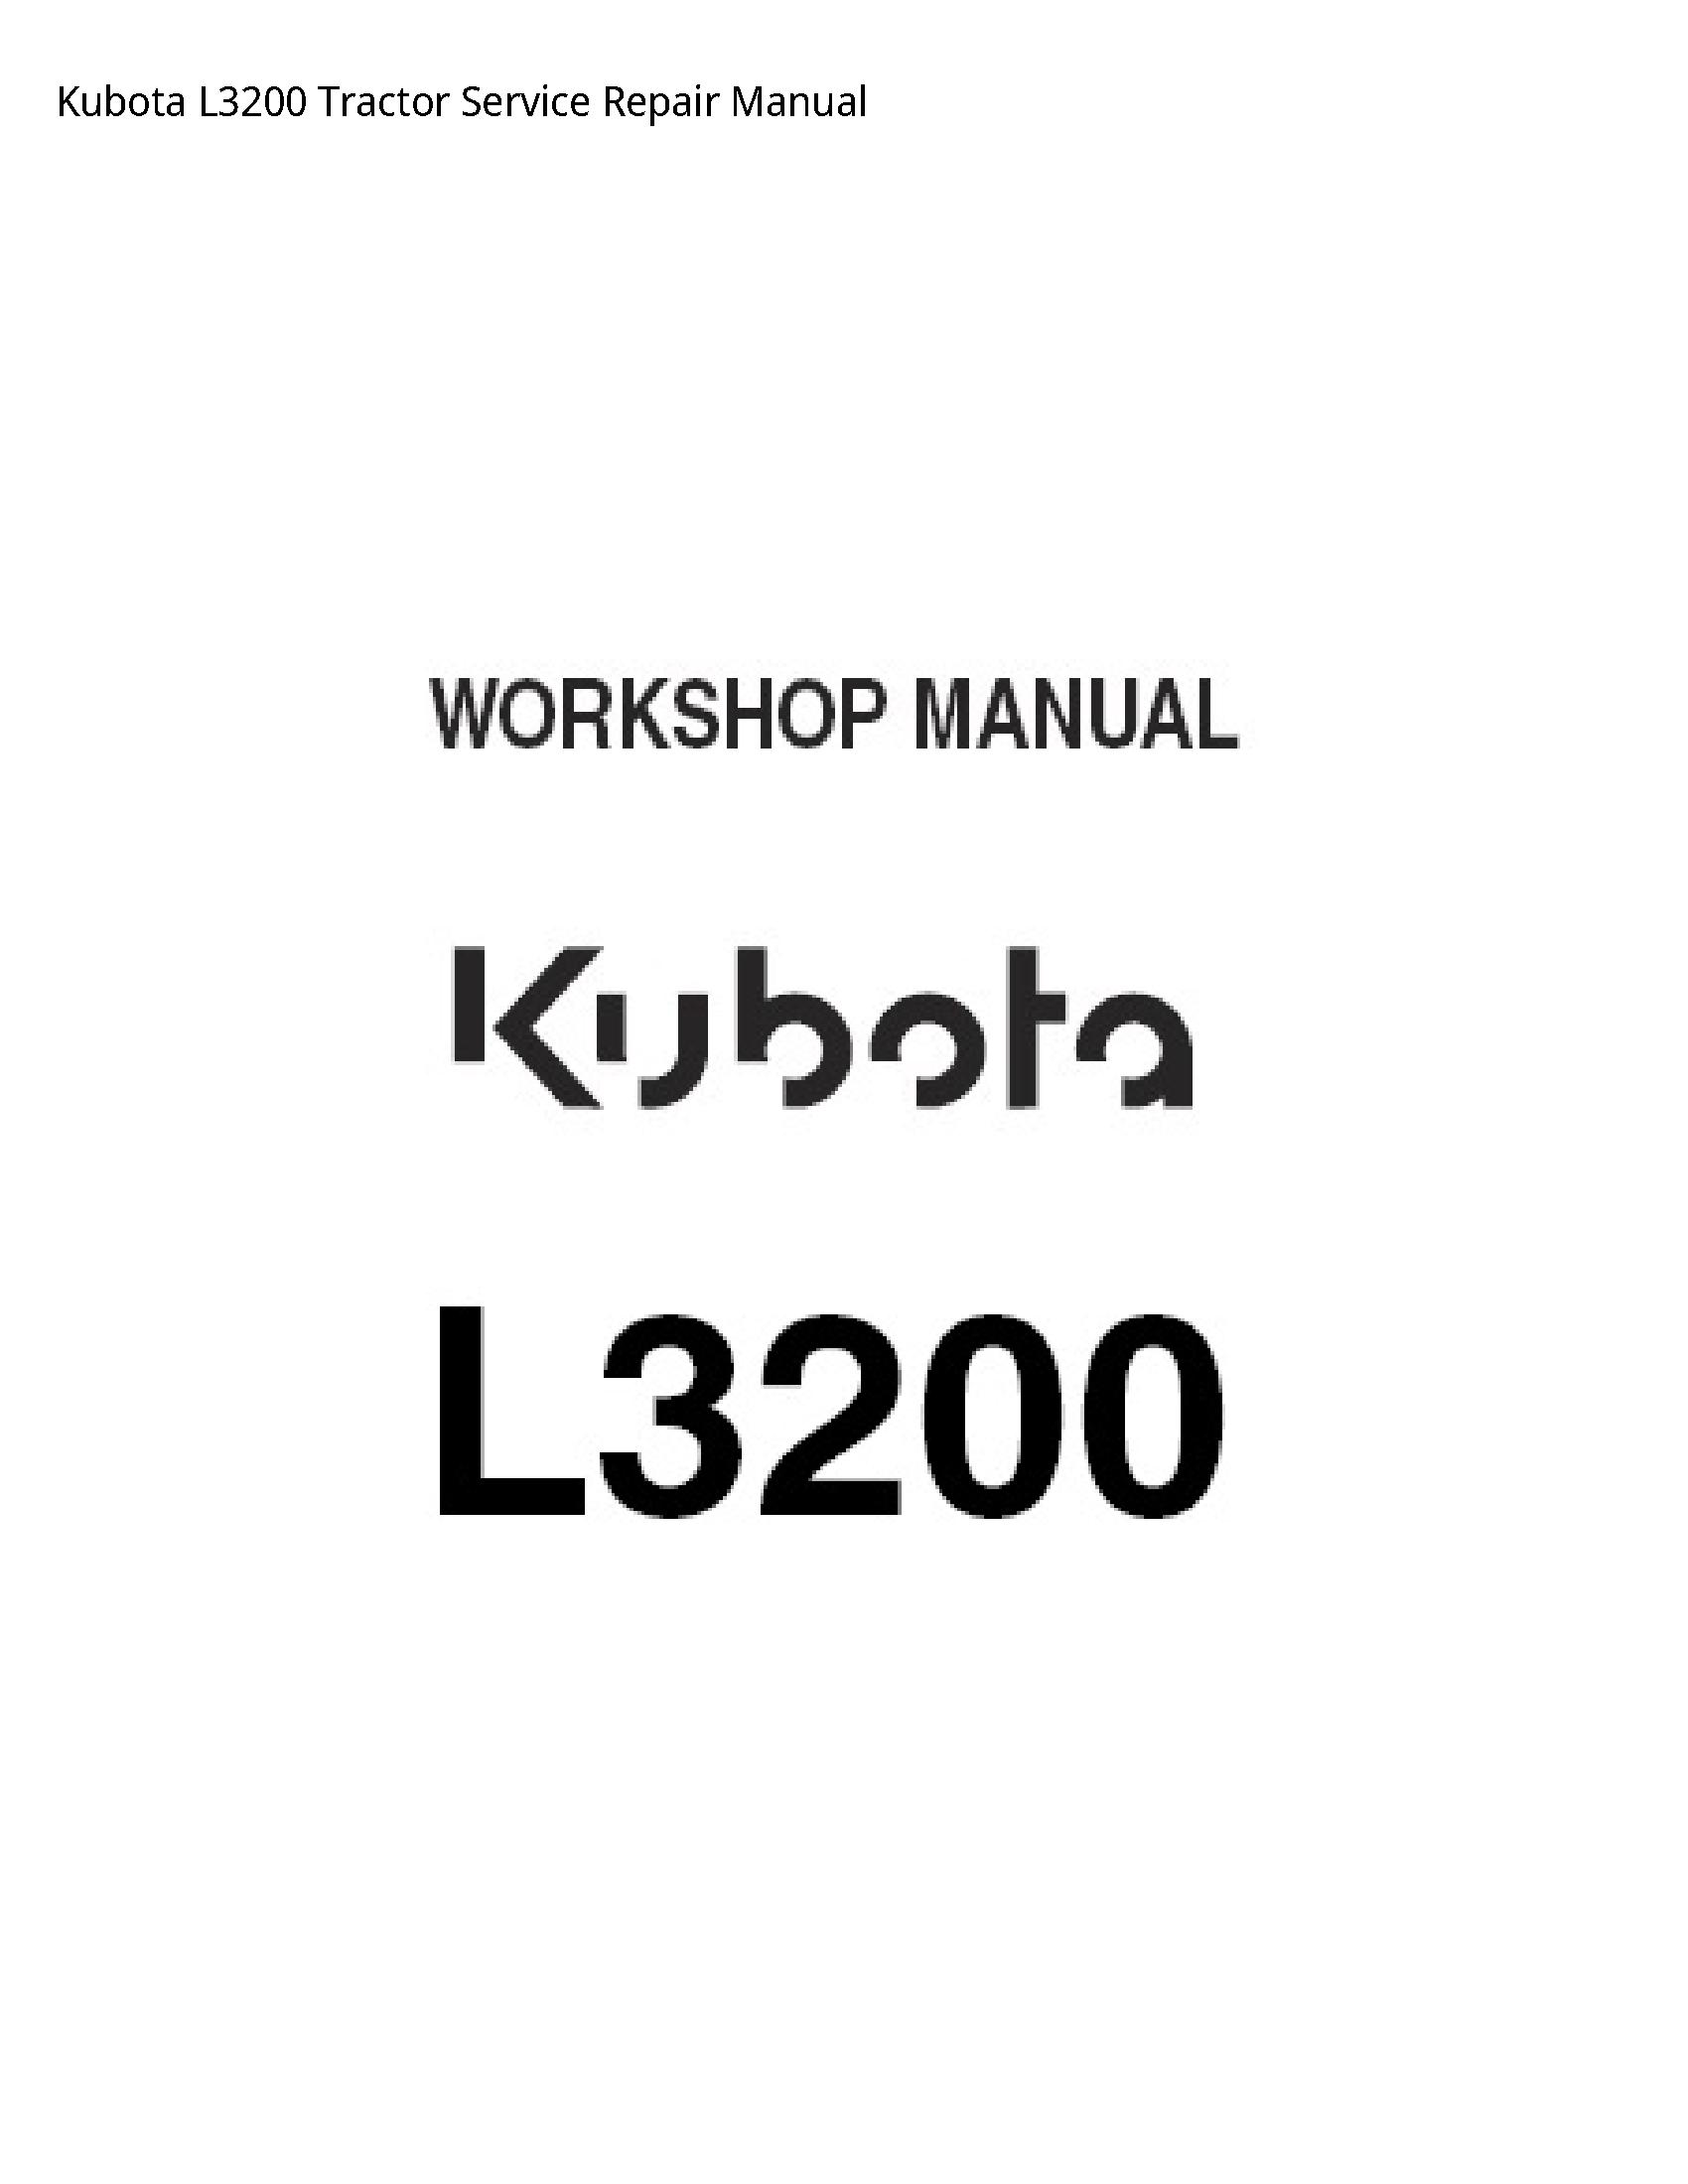 Kubota L3200 Tractor manual